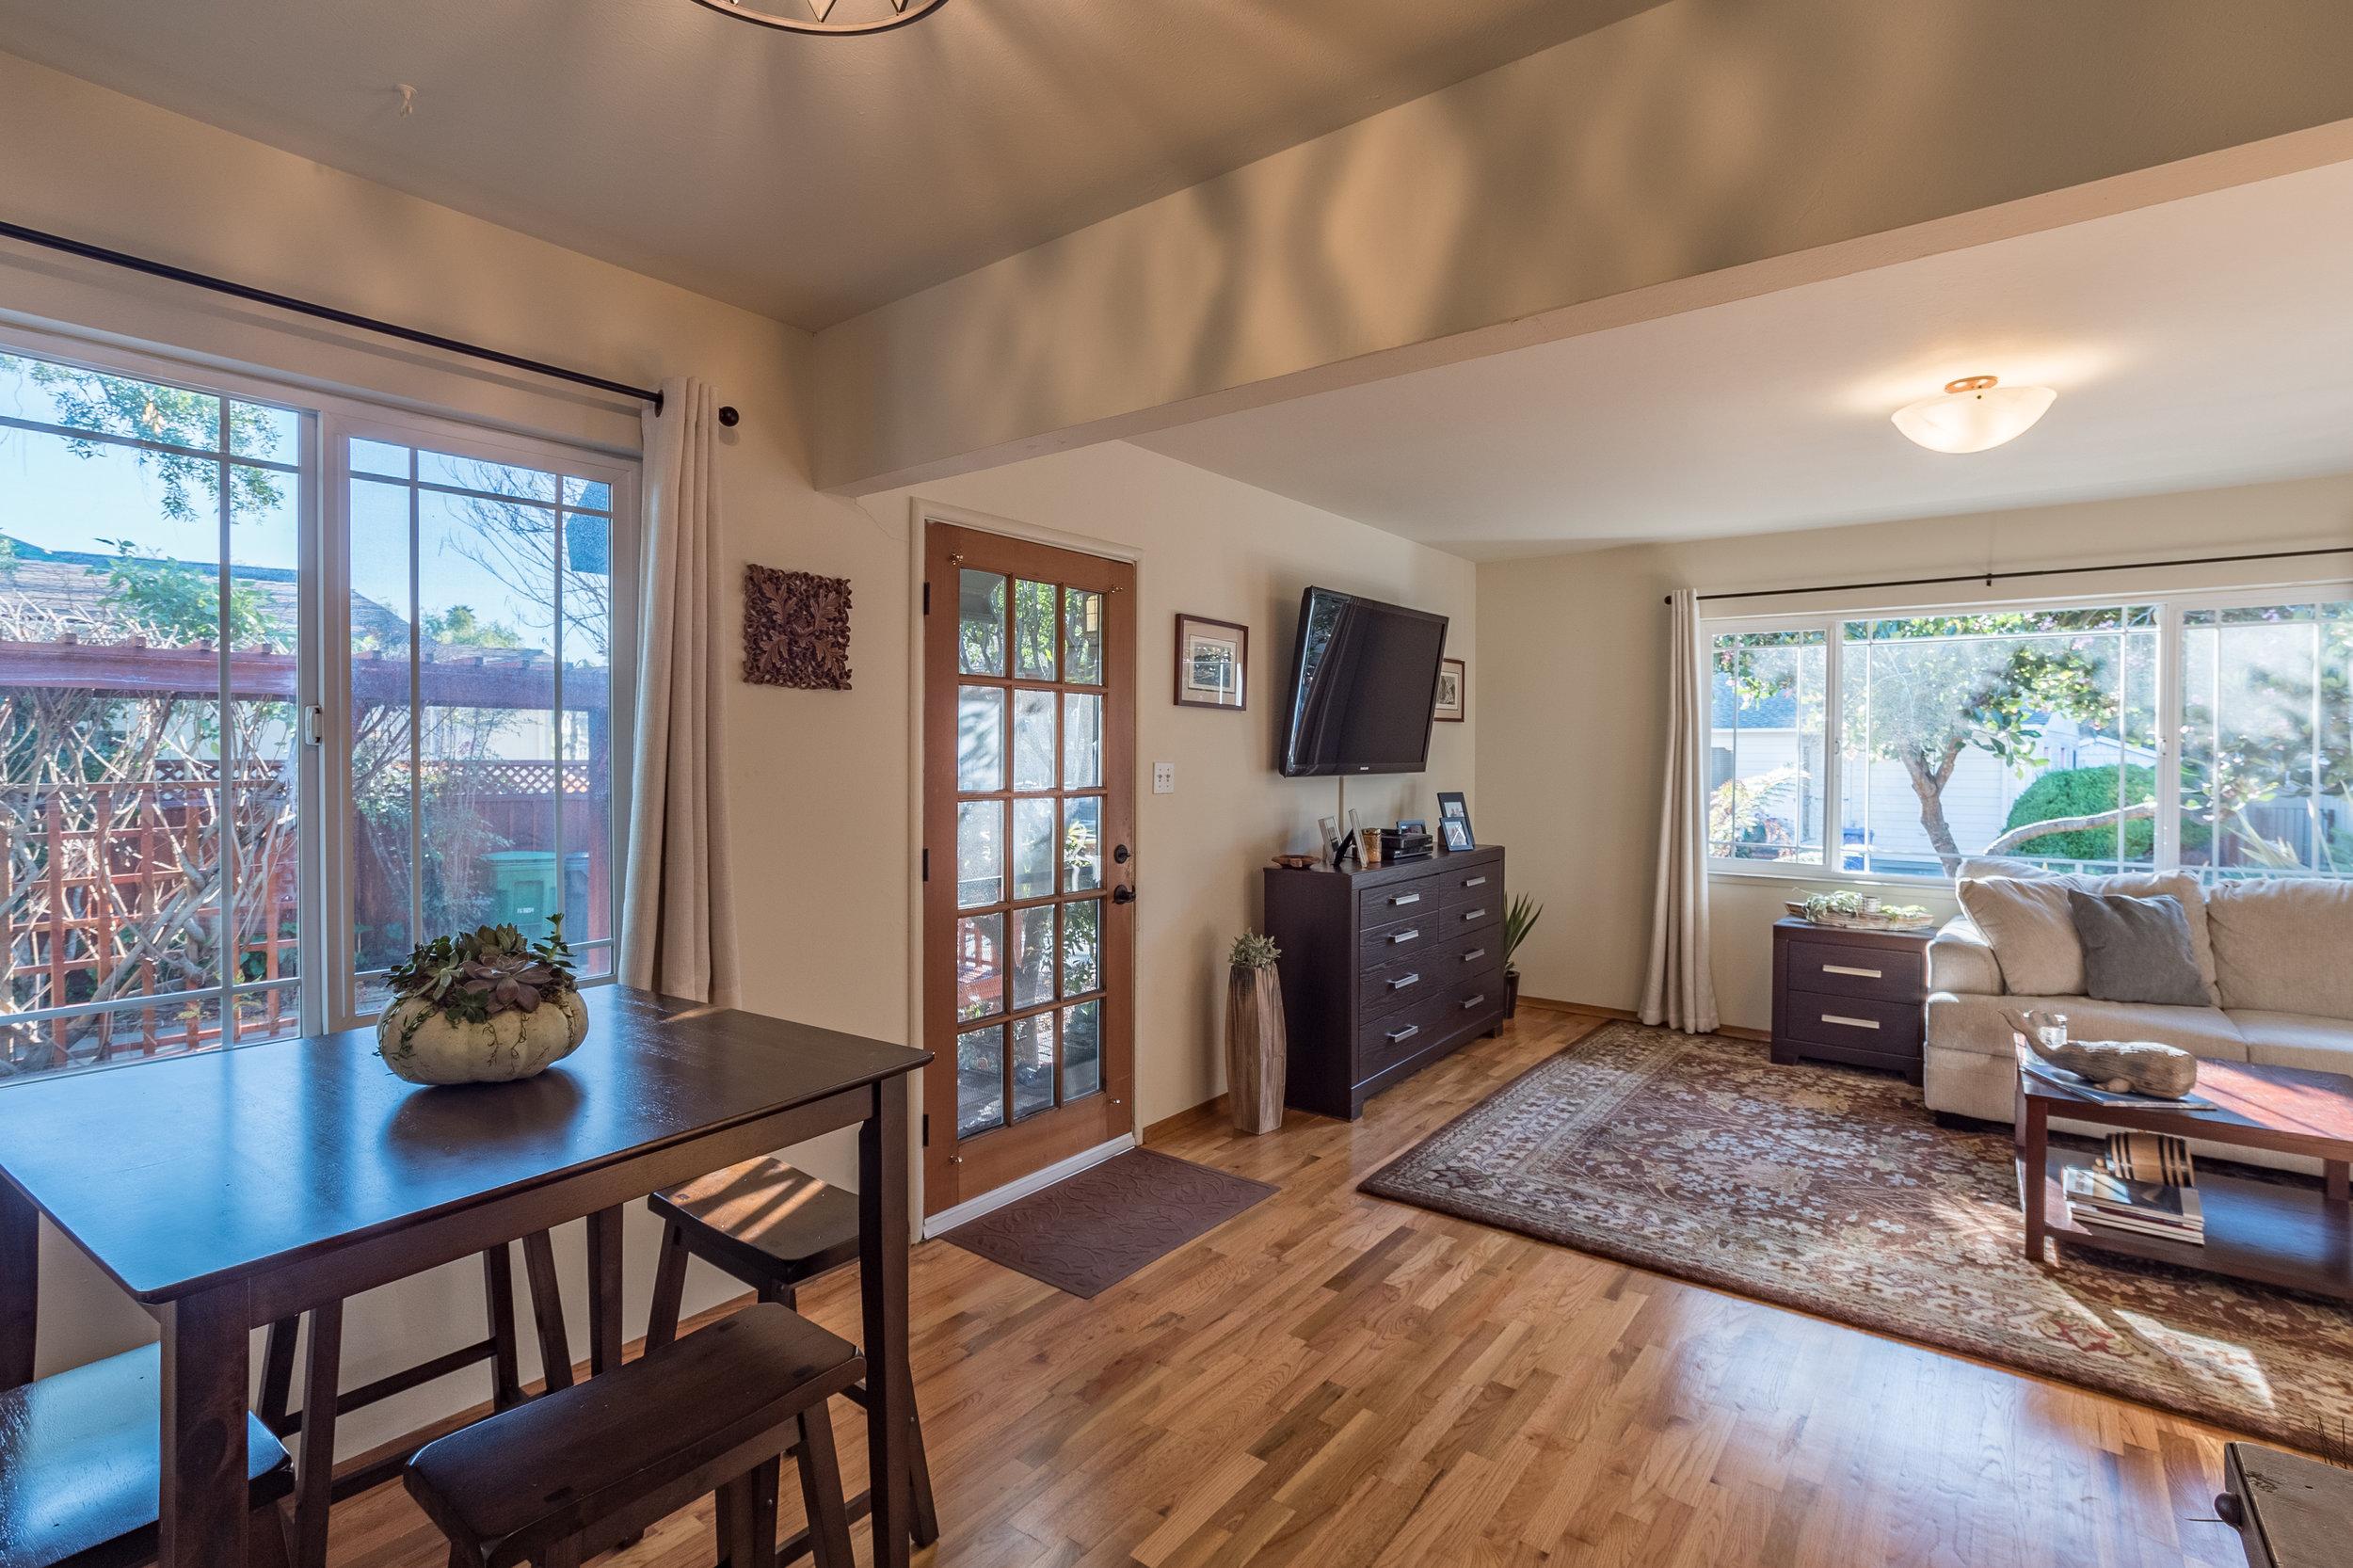 Houses for Sale Santa Cruz.jpg